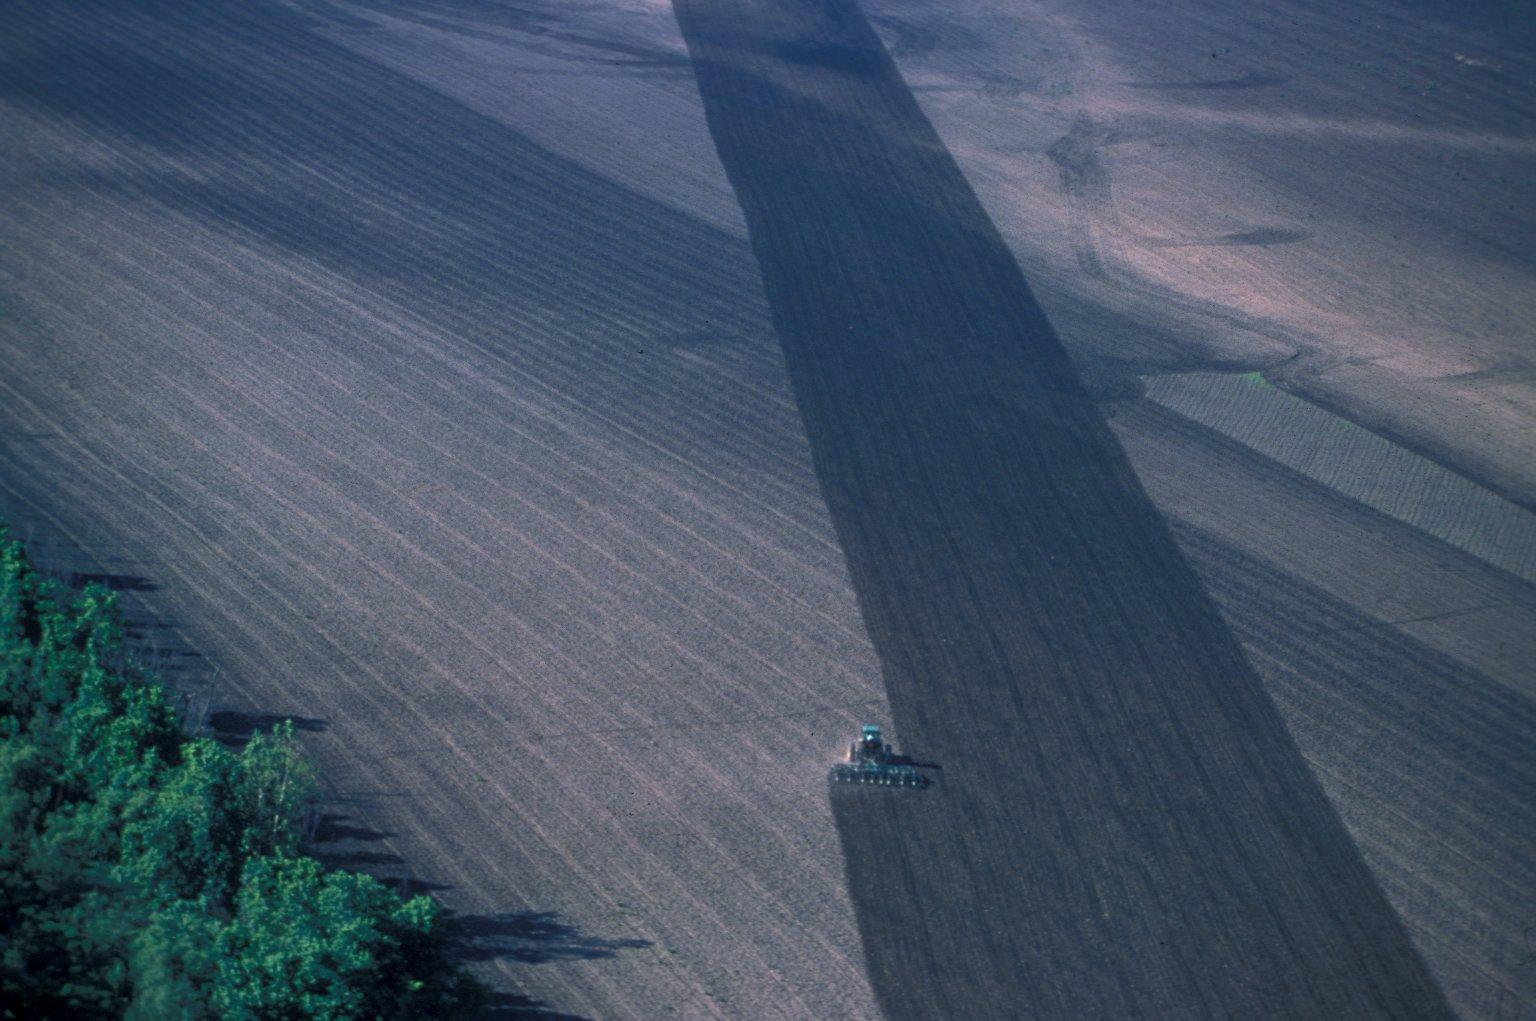 Tractor Furrowing/Plowing a field